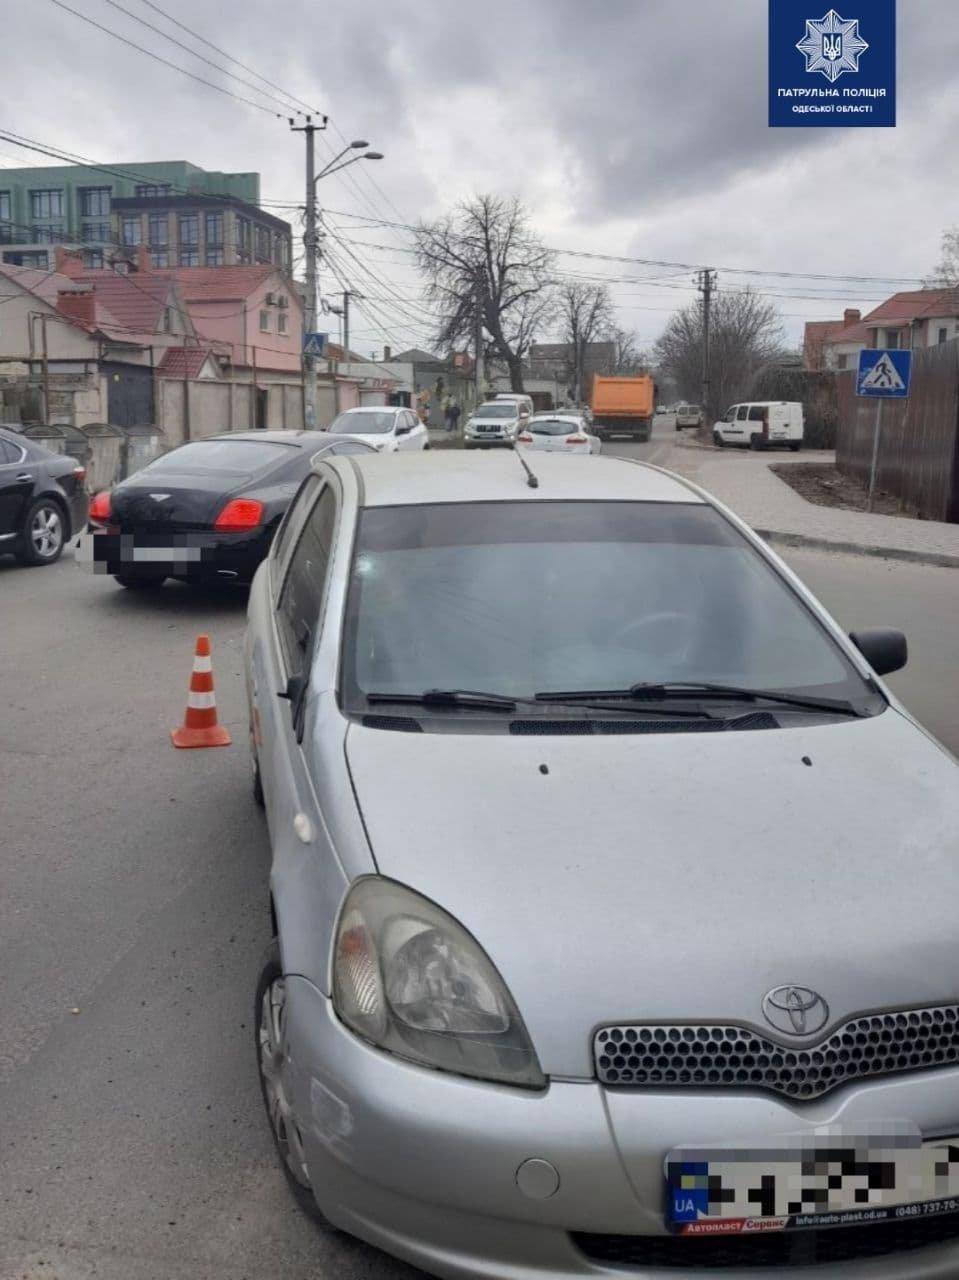 В Одессе автомобиль сбил мужчину на зебре, - ФОТО, фото-1